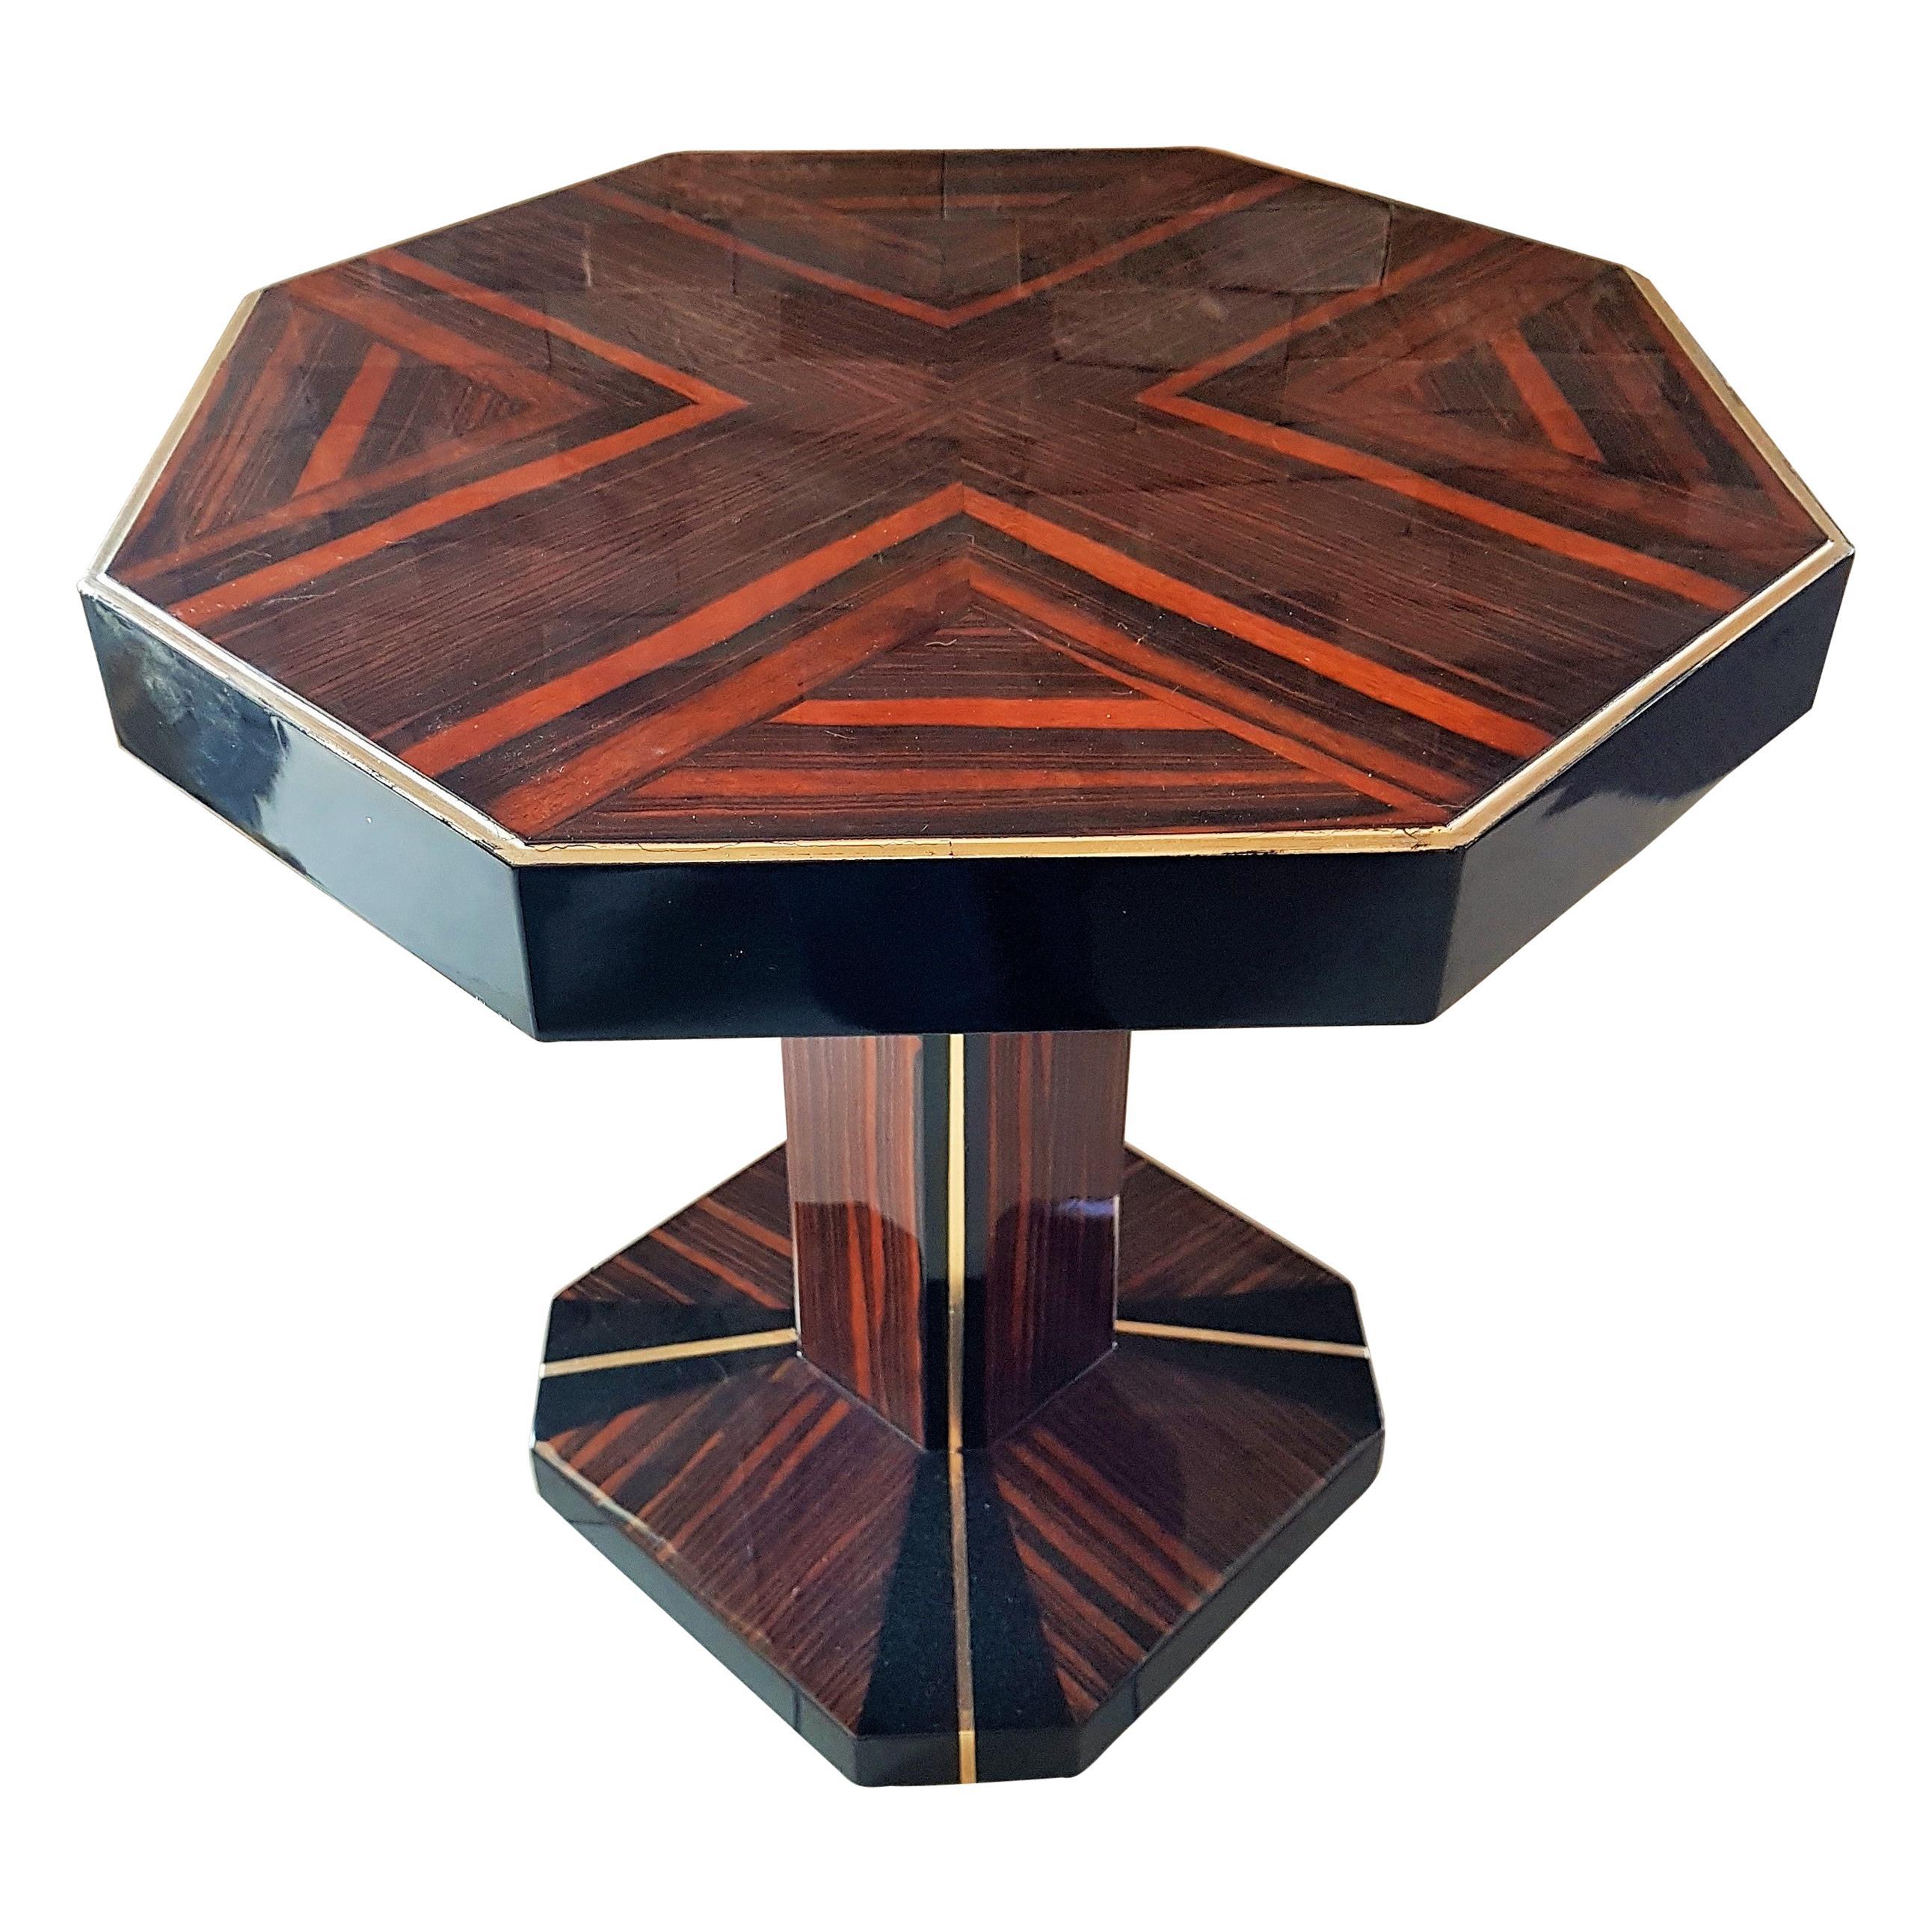 Art Deco Octagonal Side Table, France, 1930s